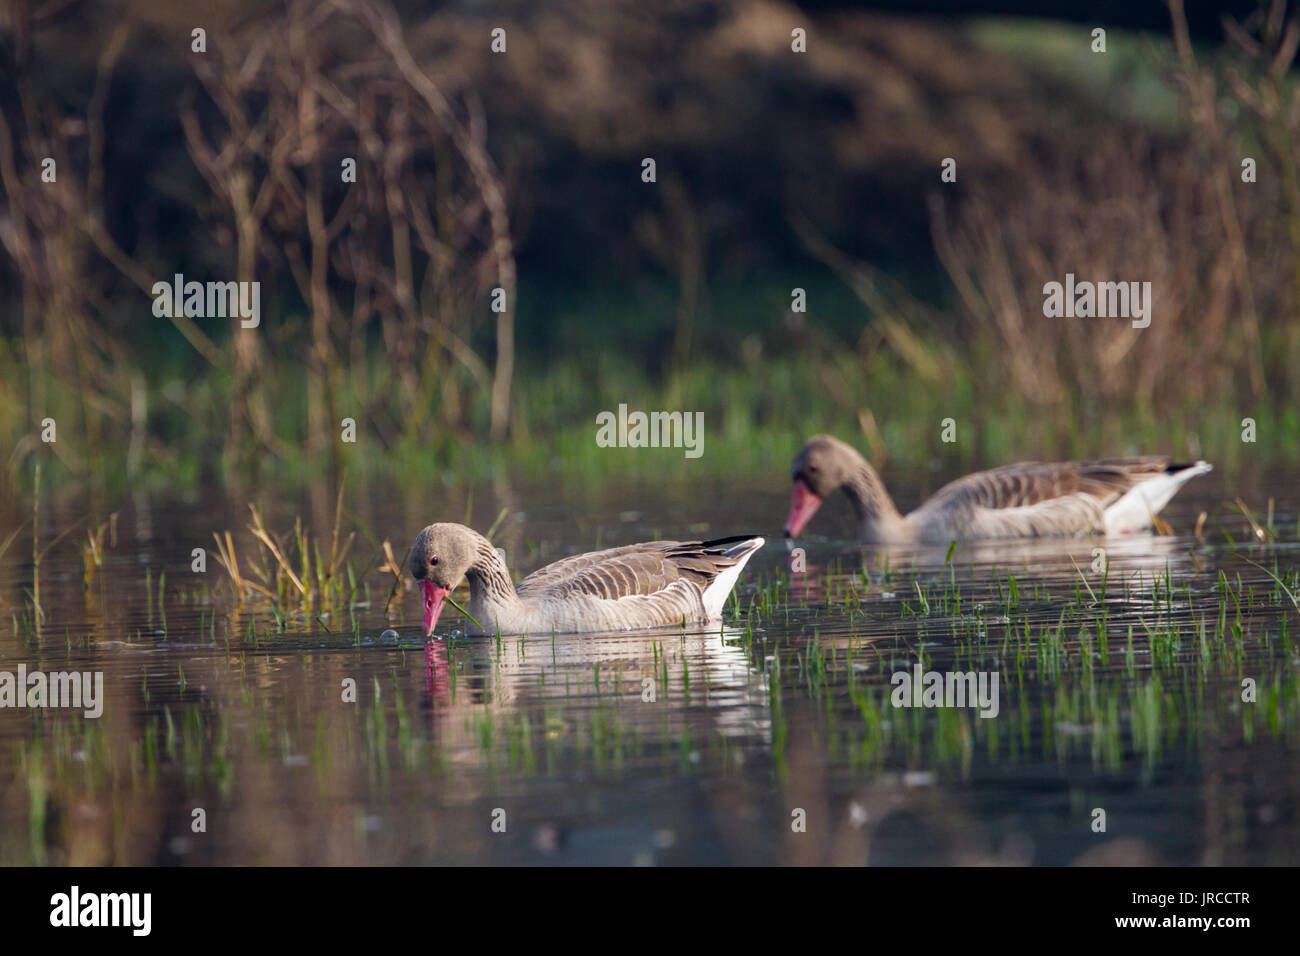 greylag goose (Anser anser) in Bharatpur Bird Sanctuary, Rajasthan, India. - Stock Image